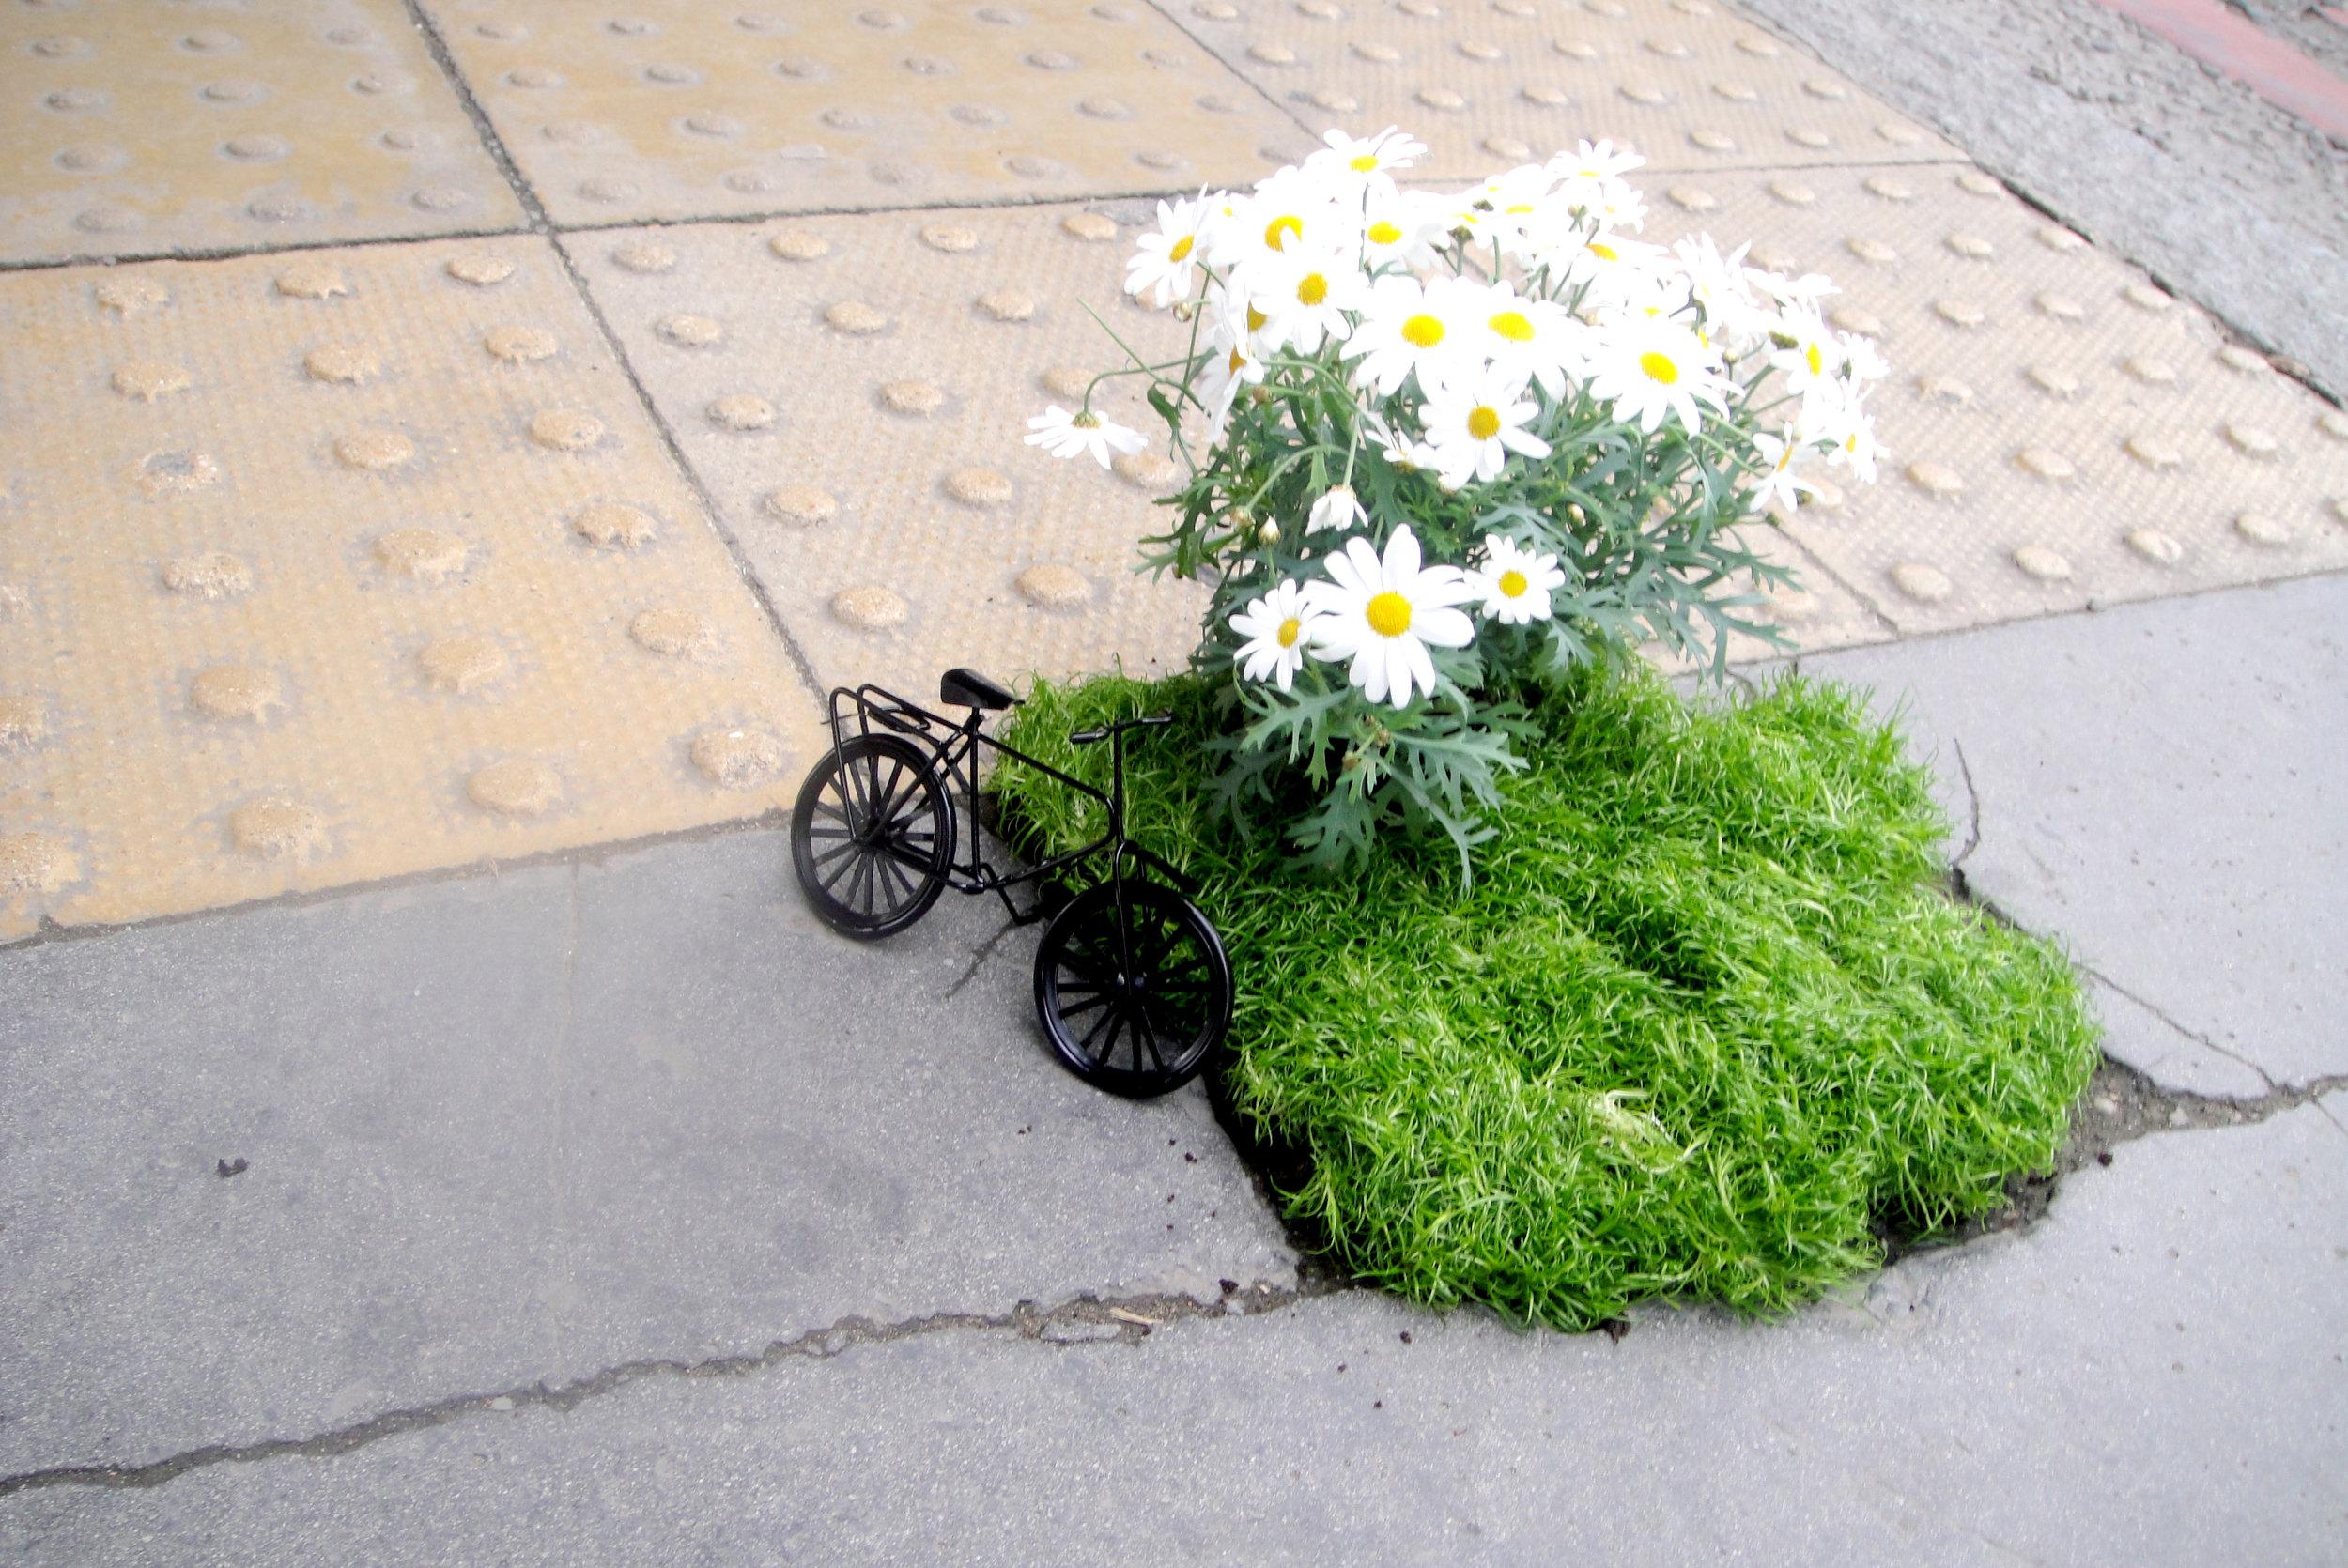 Filled in pothole in London Photo:  Little London Observationist